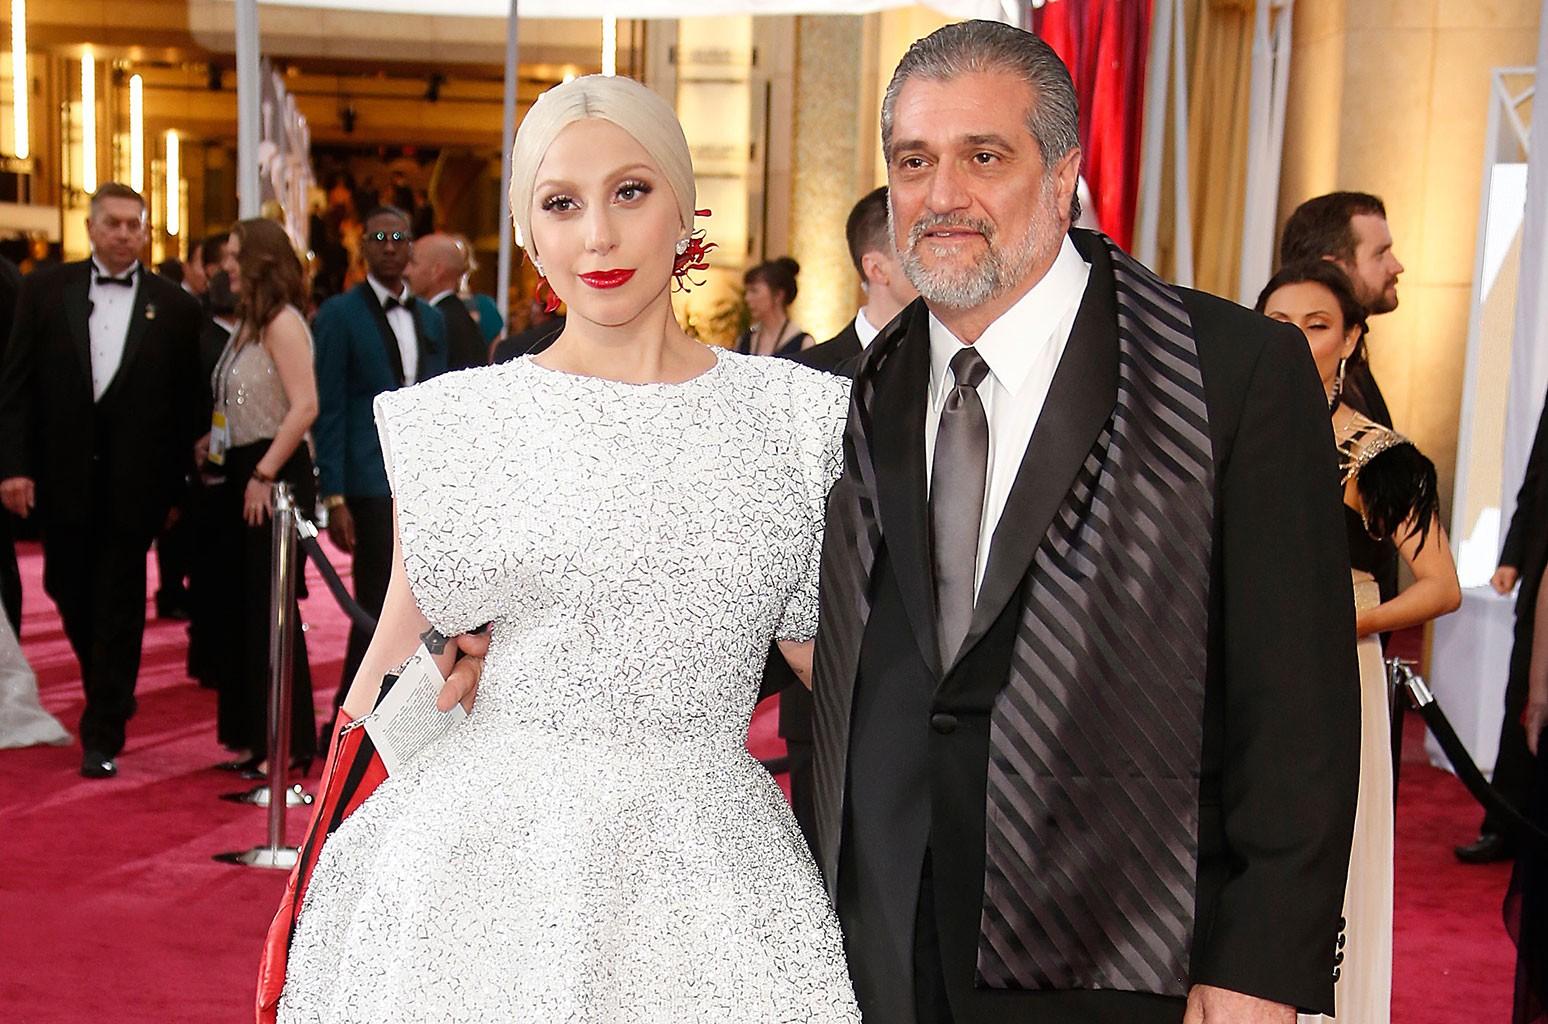 Lady Gaga and Joseph Germanotta